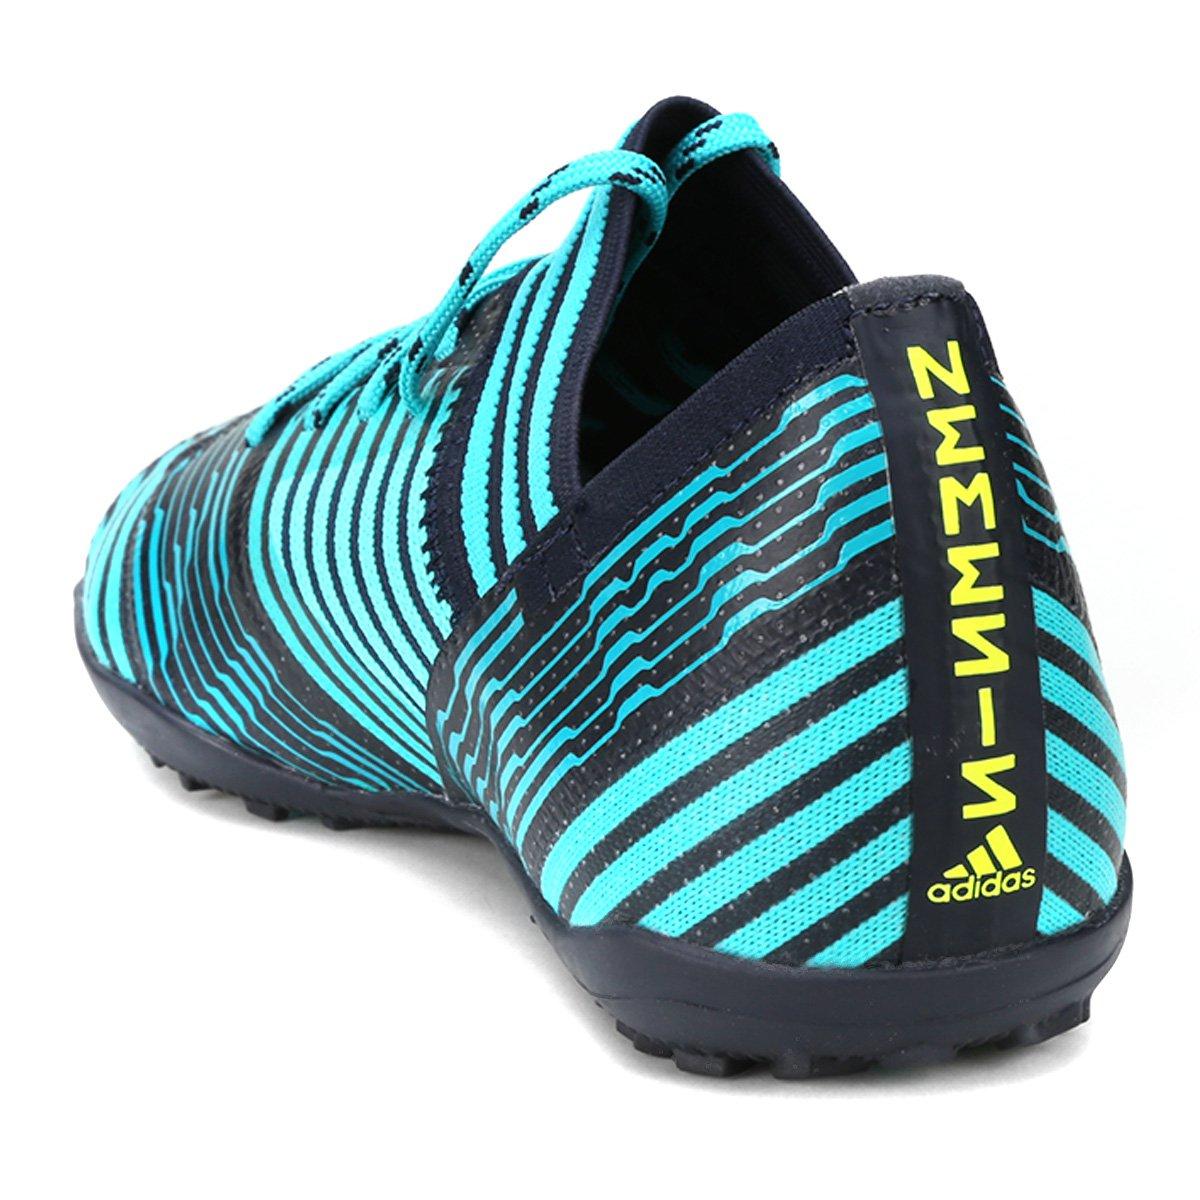 Chuteira Society Infantil Adidas Nemeziz 17.3 TF - Compre Agora ... d734b67ceaac5